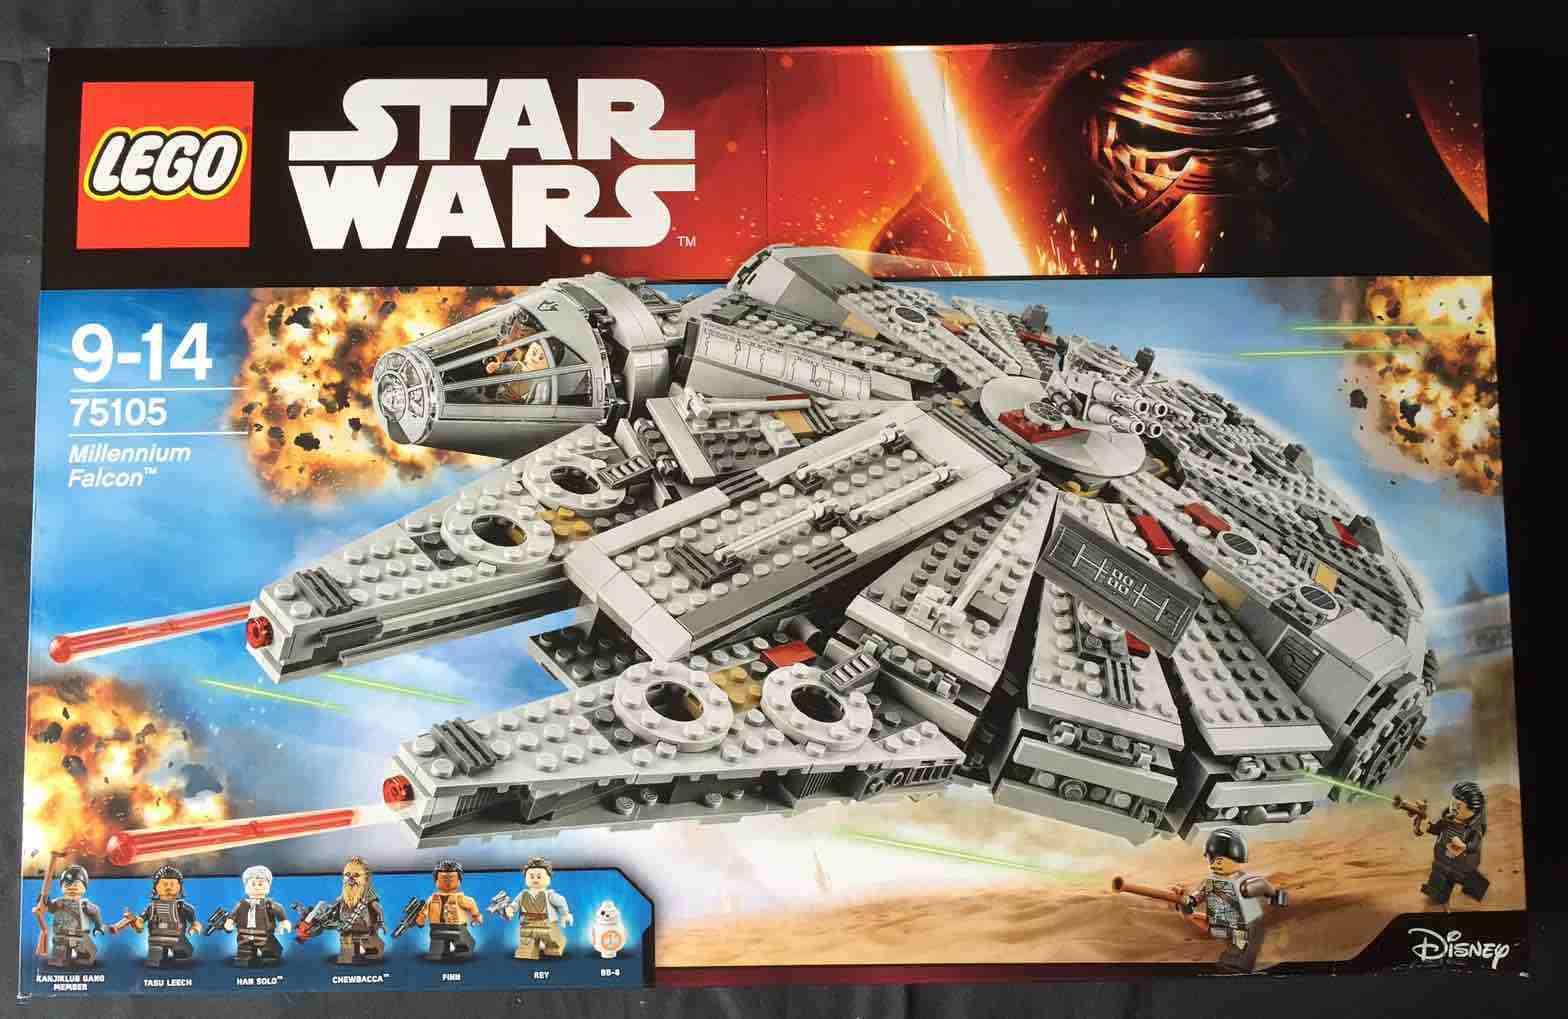 LEGO STAR WARS 75105 - MILLENNIUM FALCON NICHT MINIFIGUREN / NICHT MINIFIGUREN